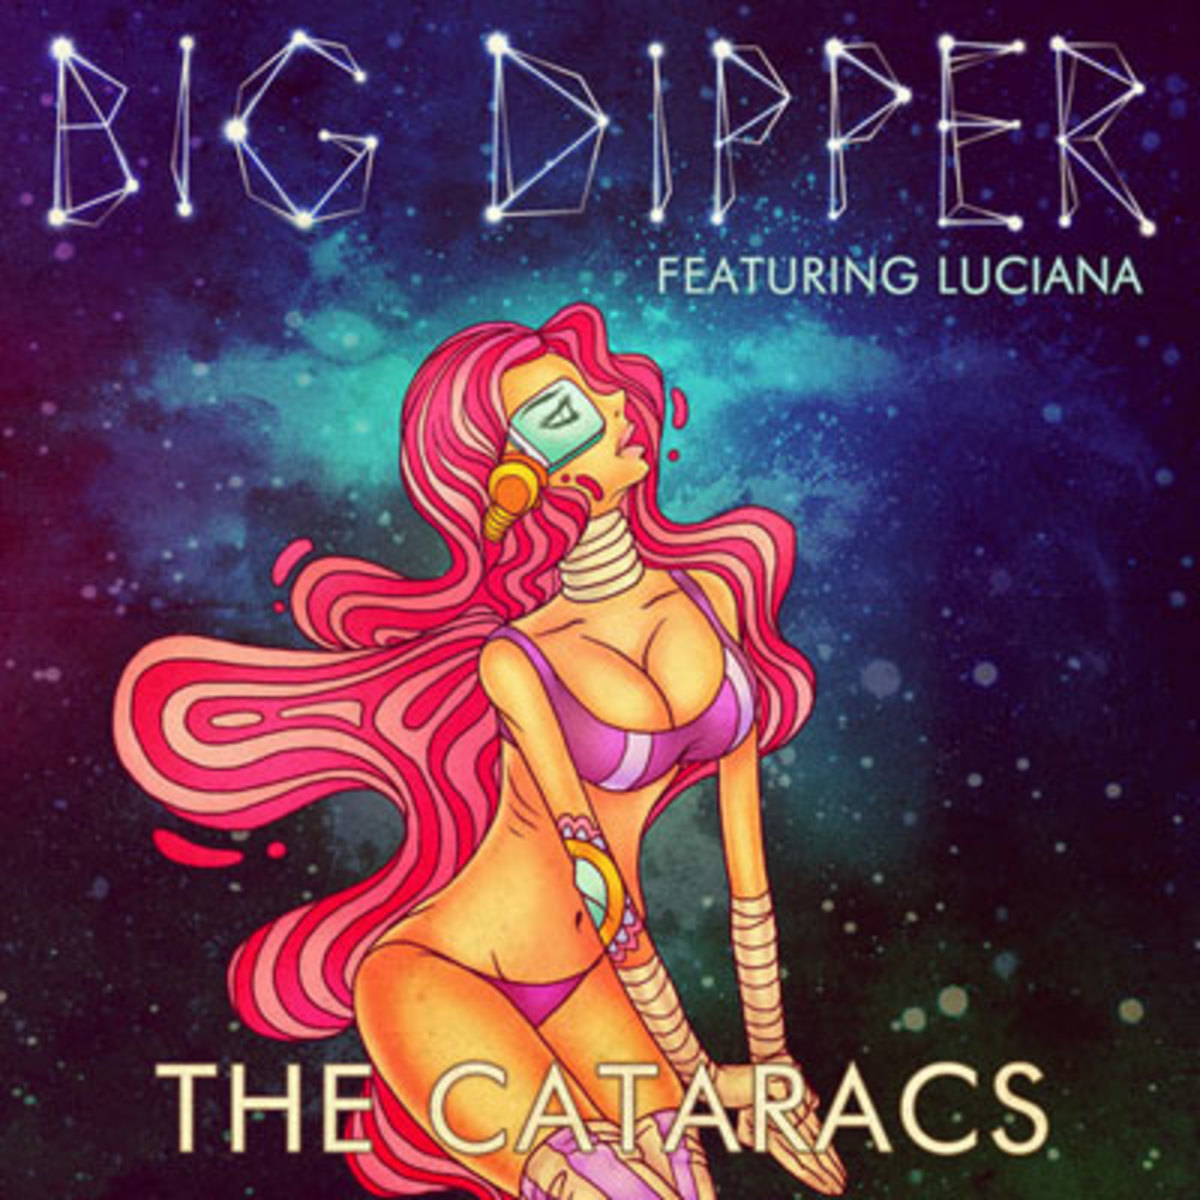 thecataracs-bigdipper.jpg